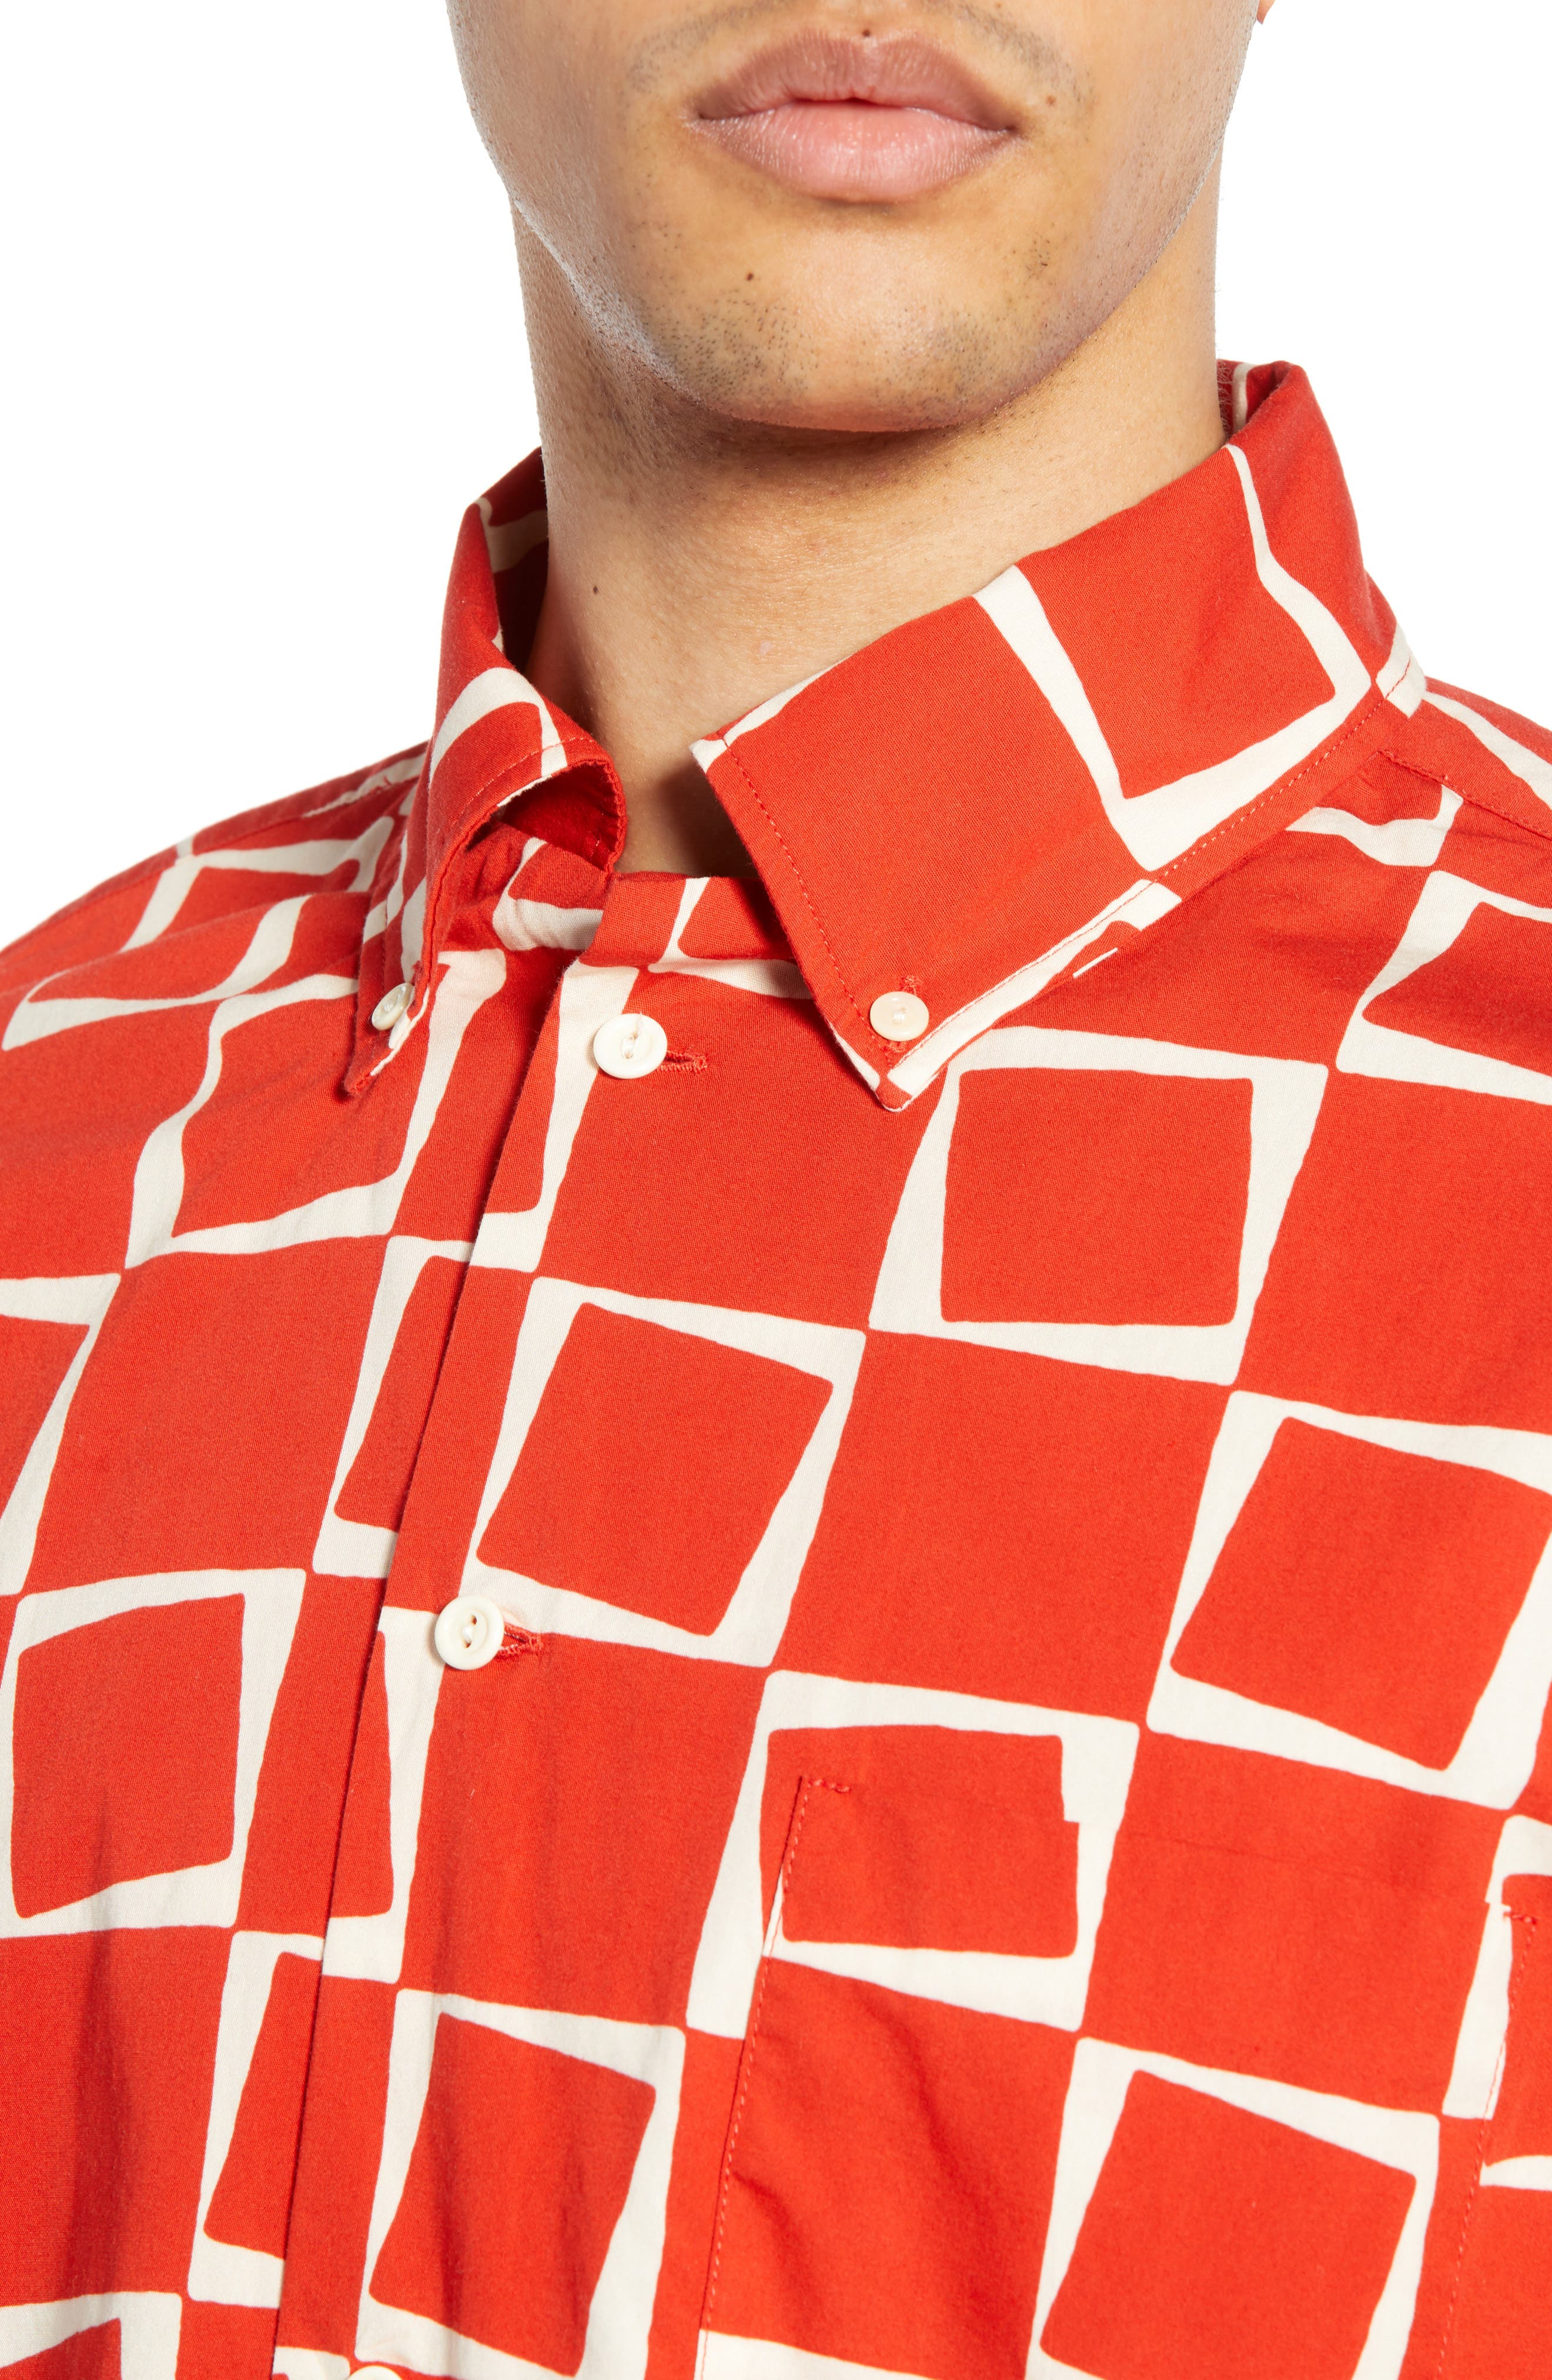 LEVI'S<SUP>®</SUP> VINTAGE CLOTHING, 1950s Regular Atomic Square Woven Shirt, Alternate thumbnail 2, color, 600